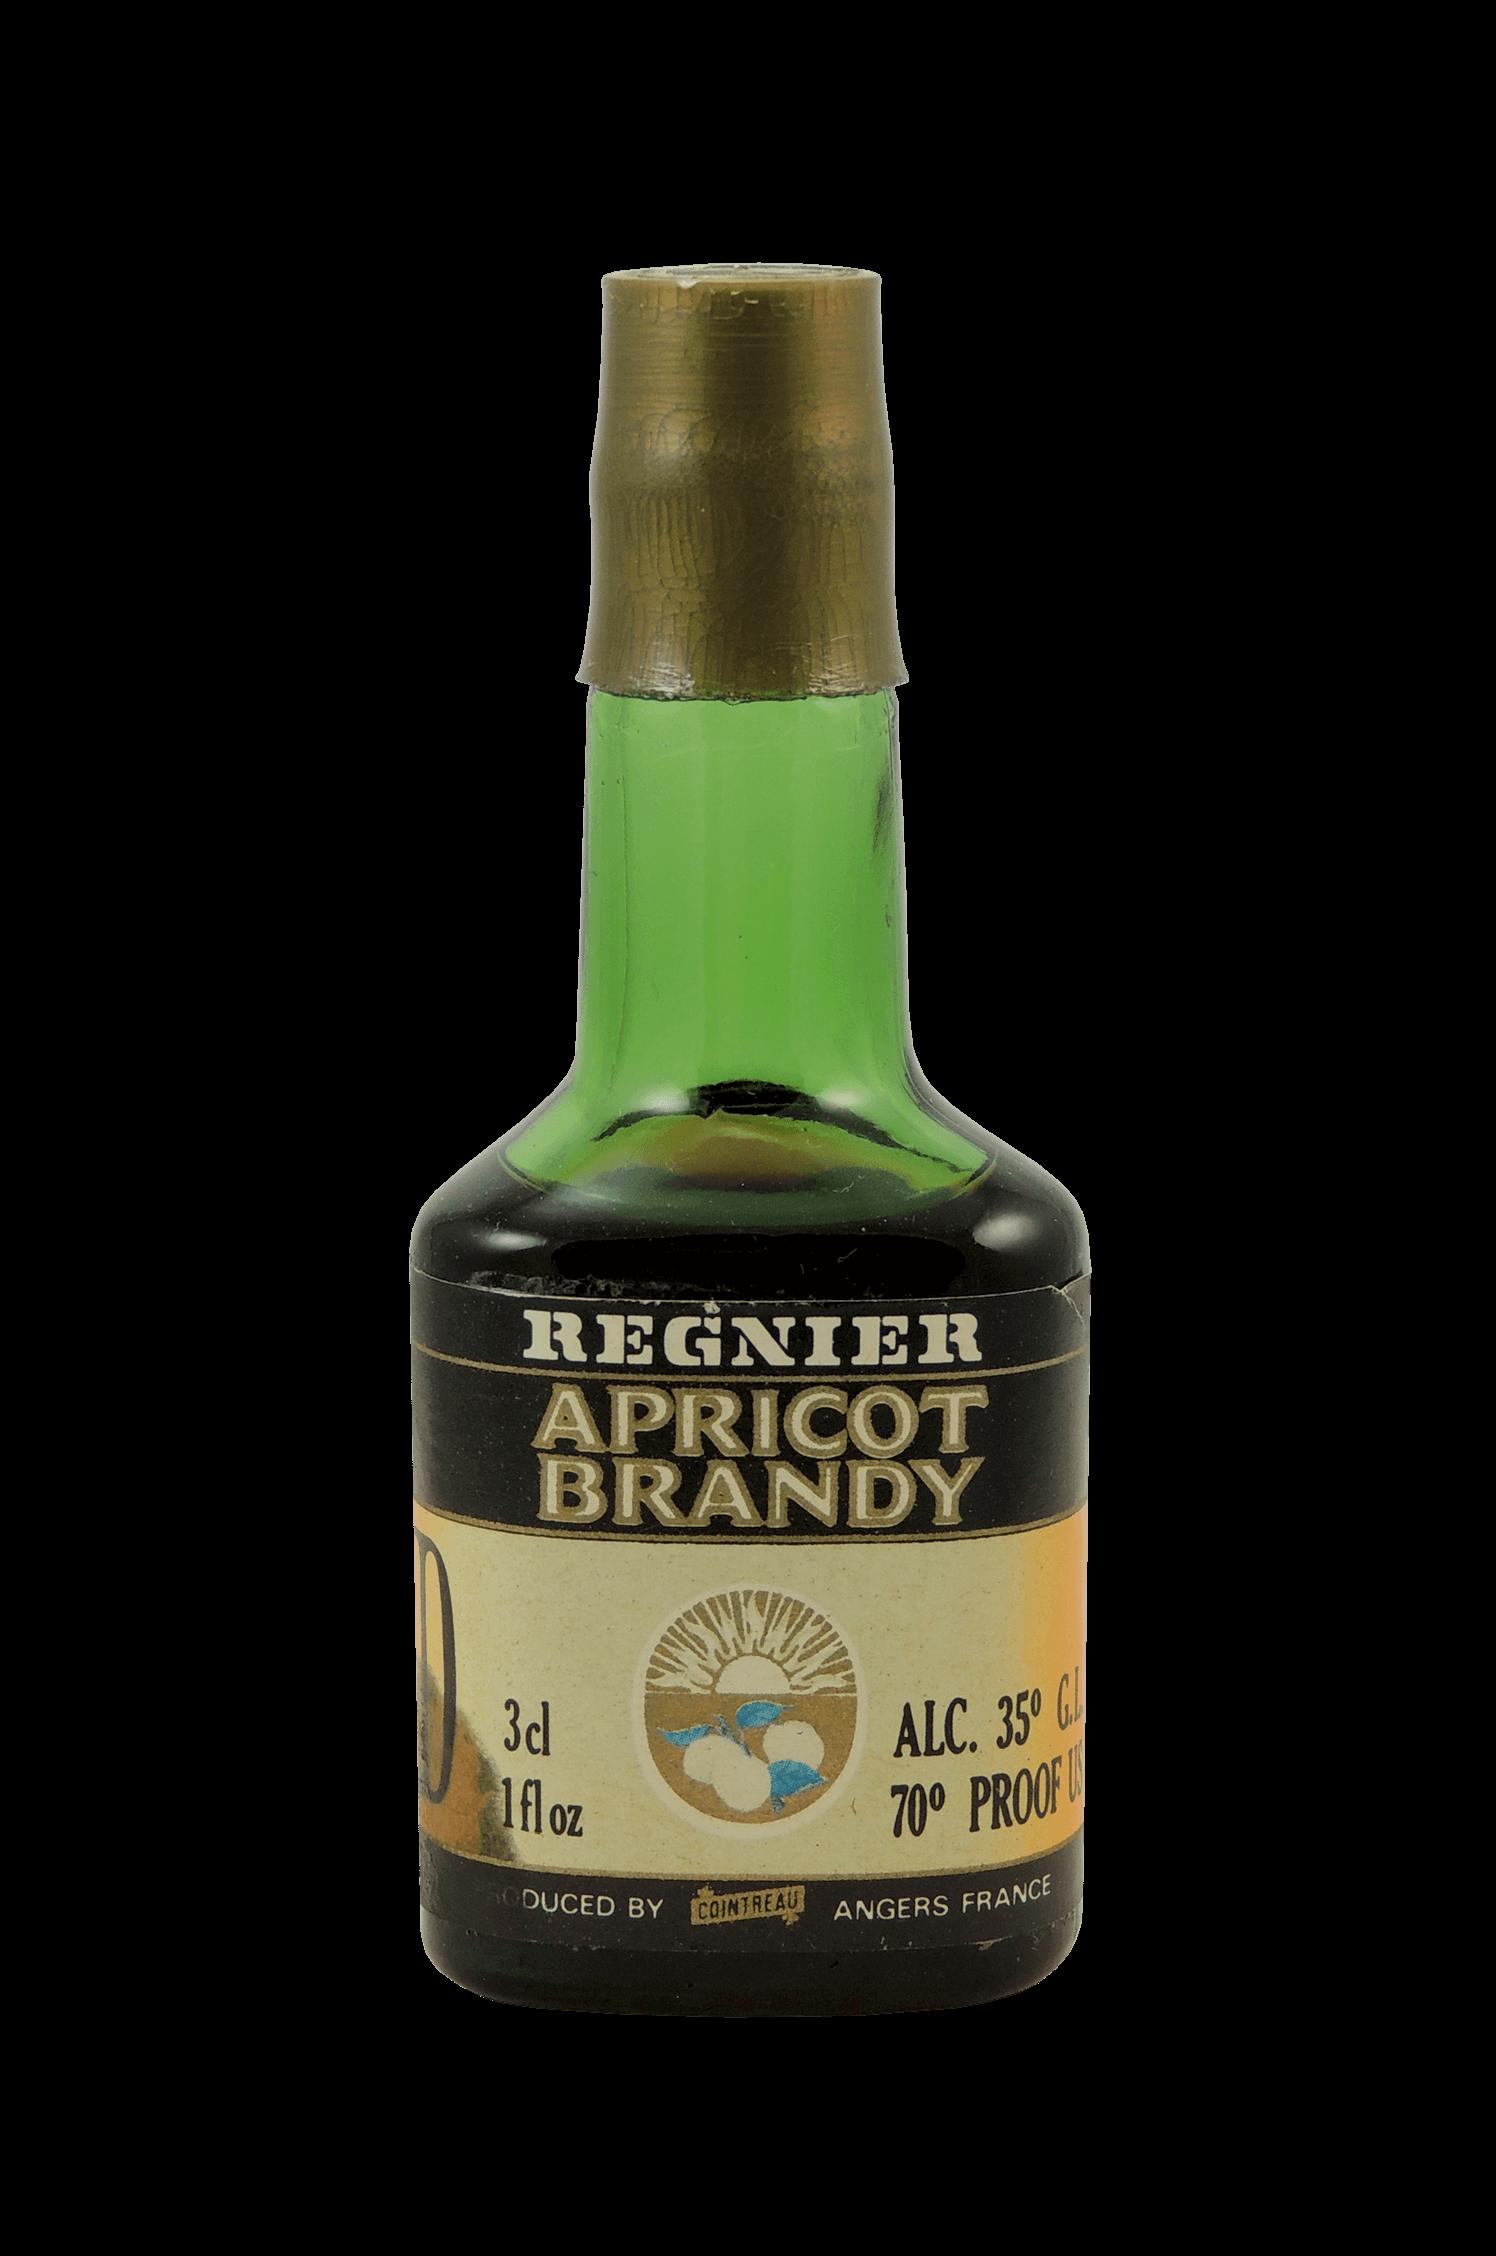 Regnier Apricot Brandy